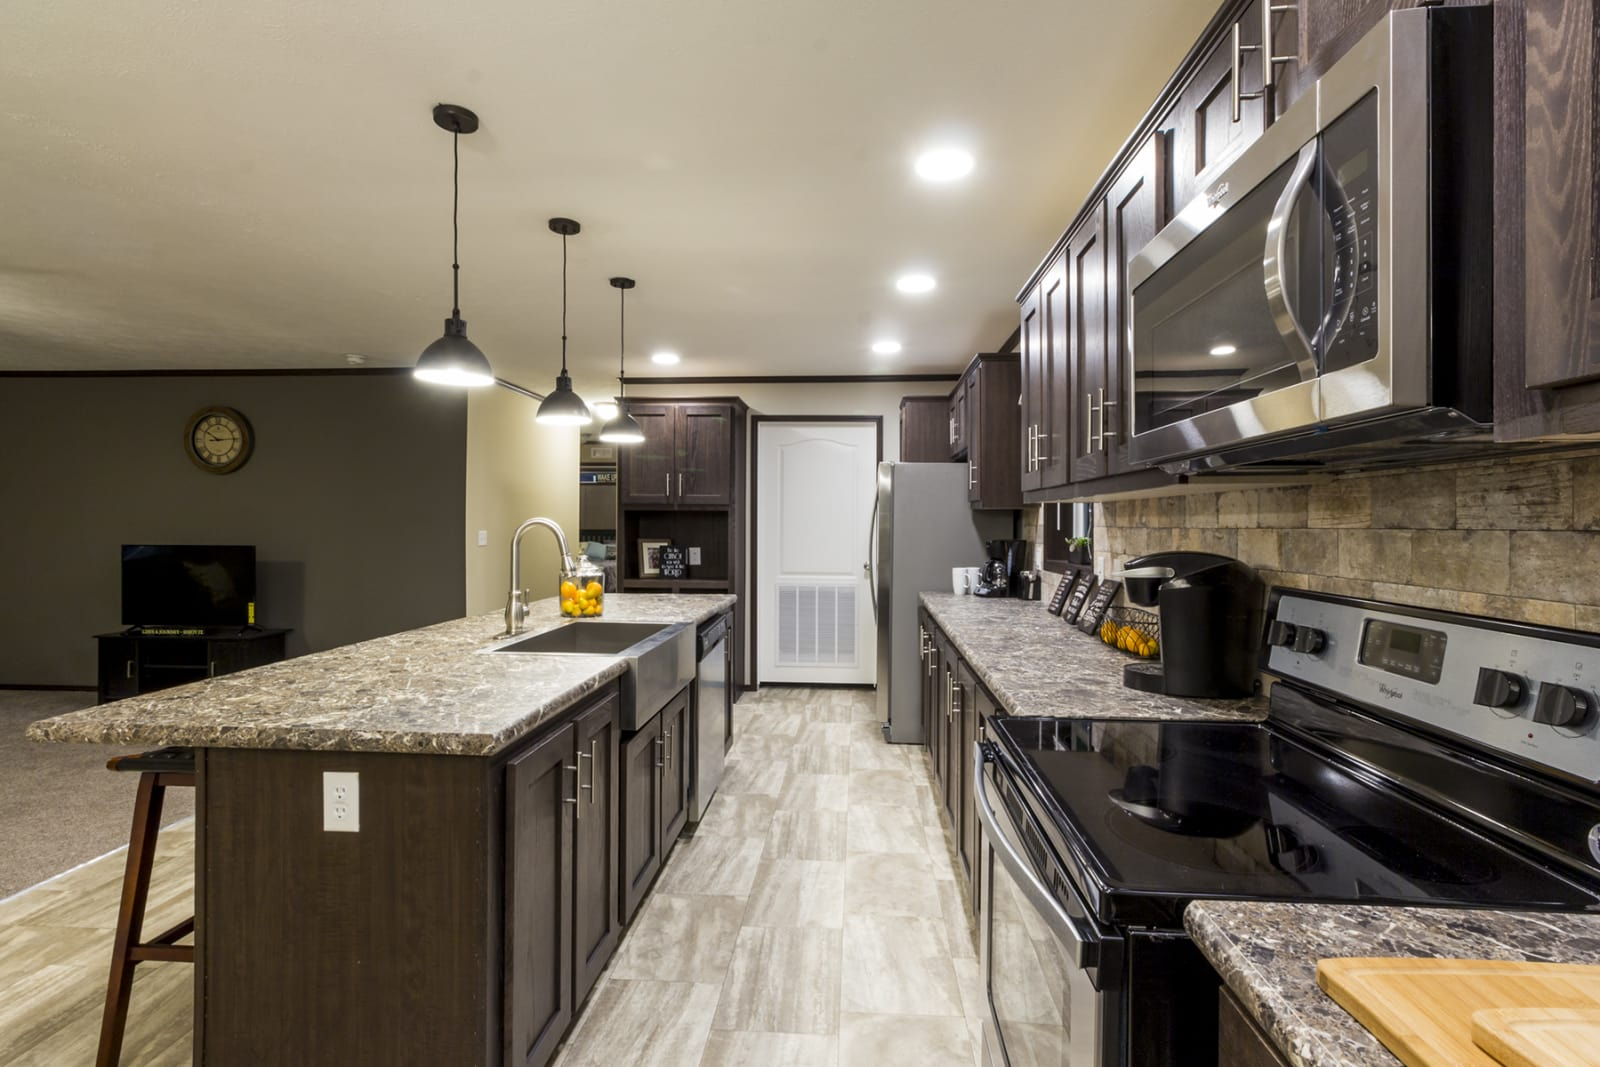 Northwood A 25610 Redman Homes Champion Homes